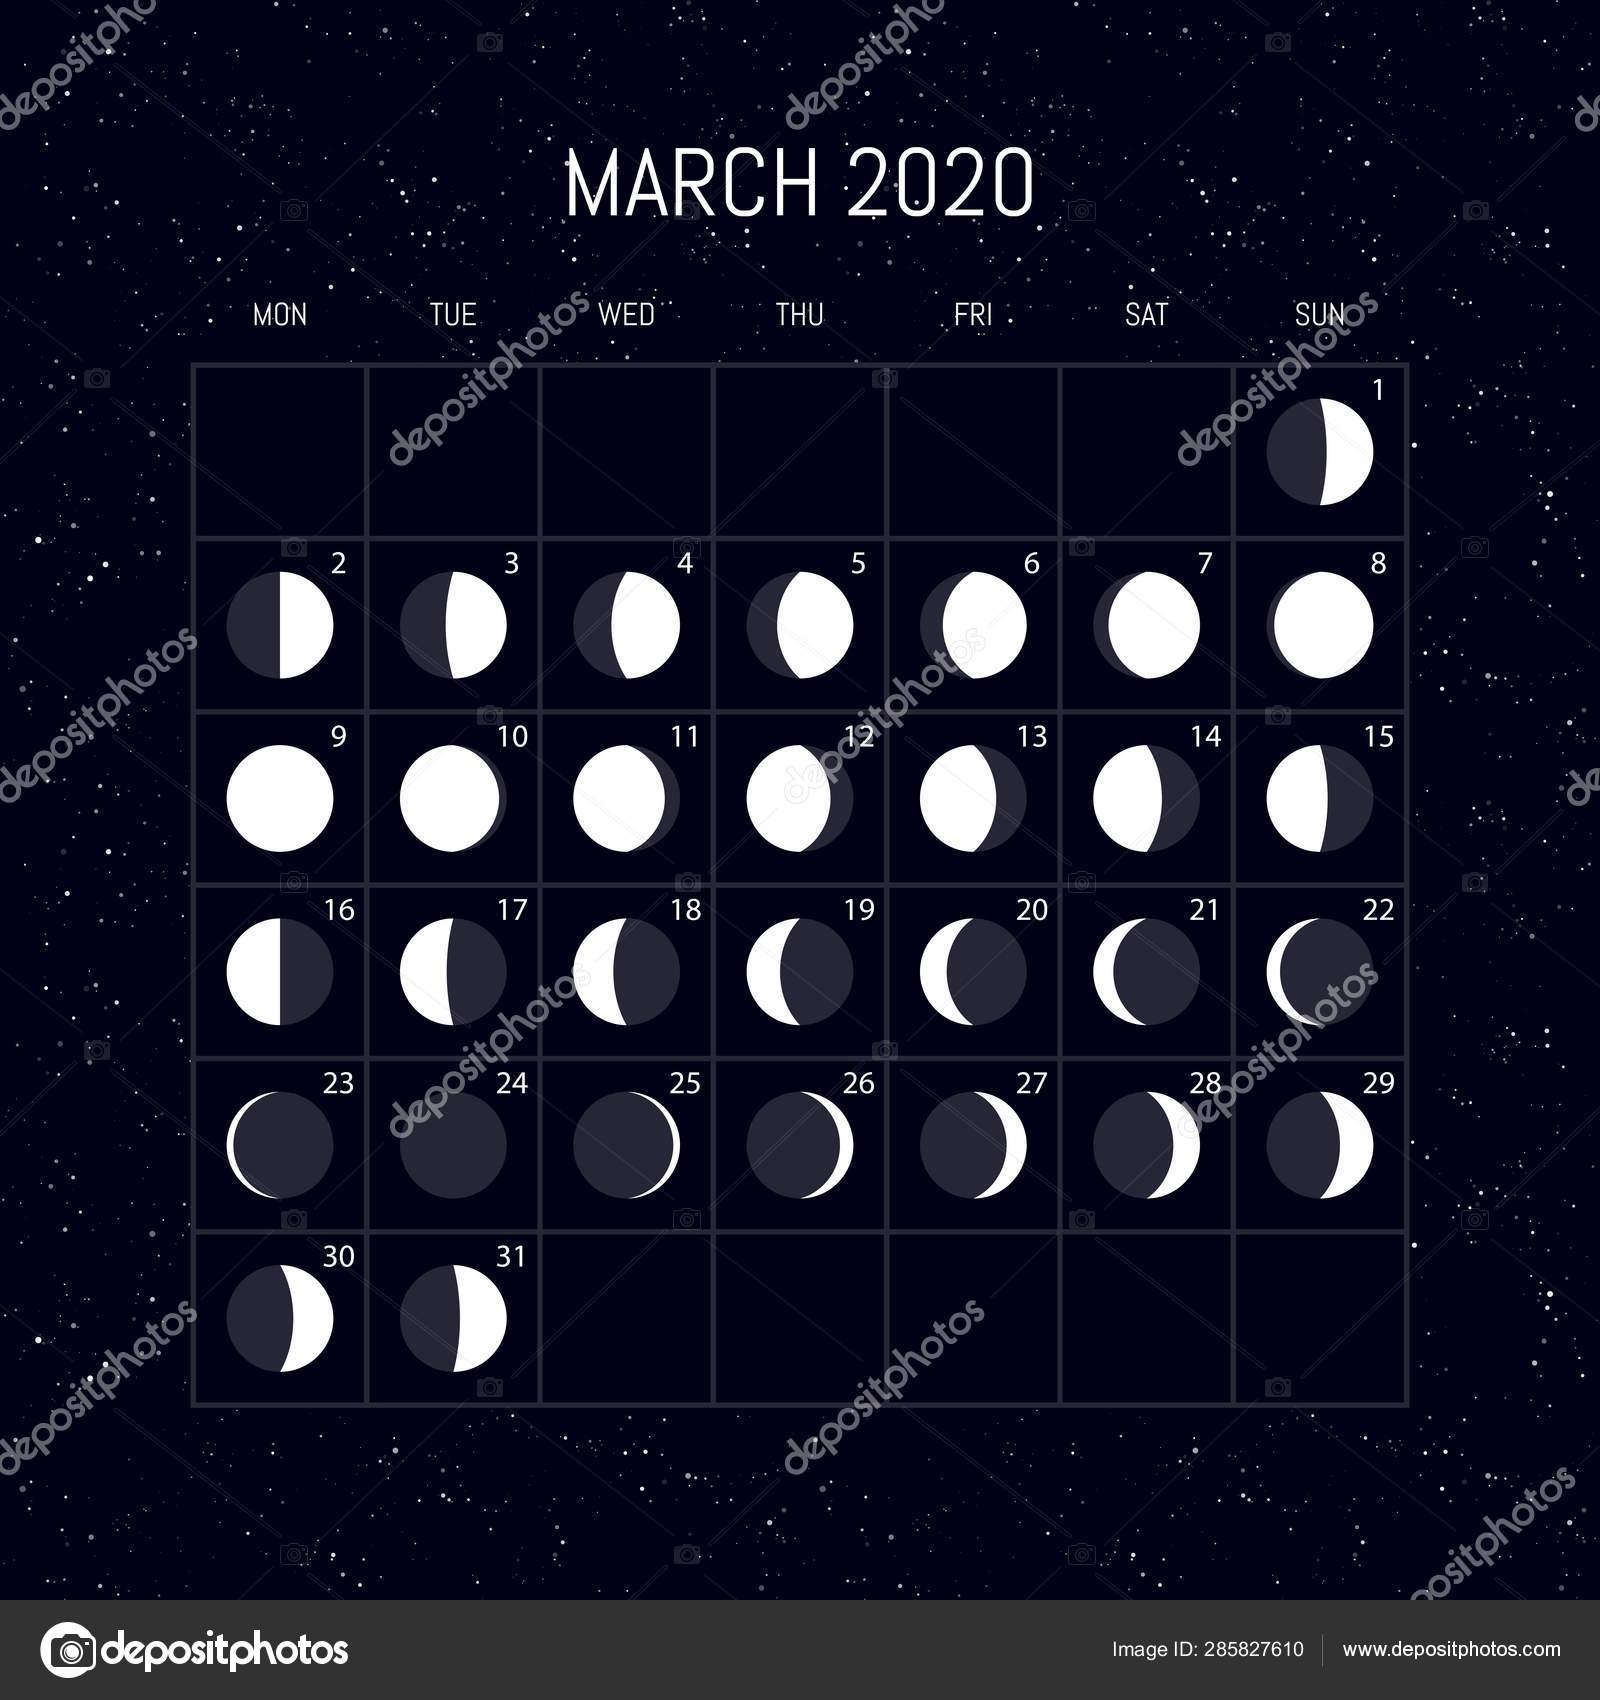 Moon Phases Calendar For 2020 Year. March. Night Background March 2020 Lunar Calendar